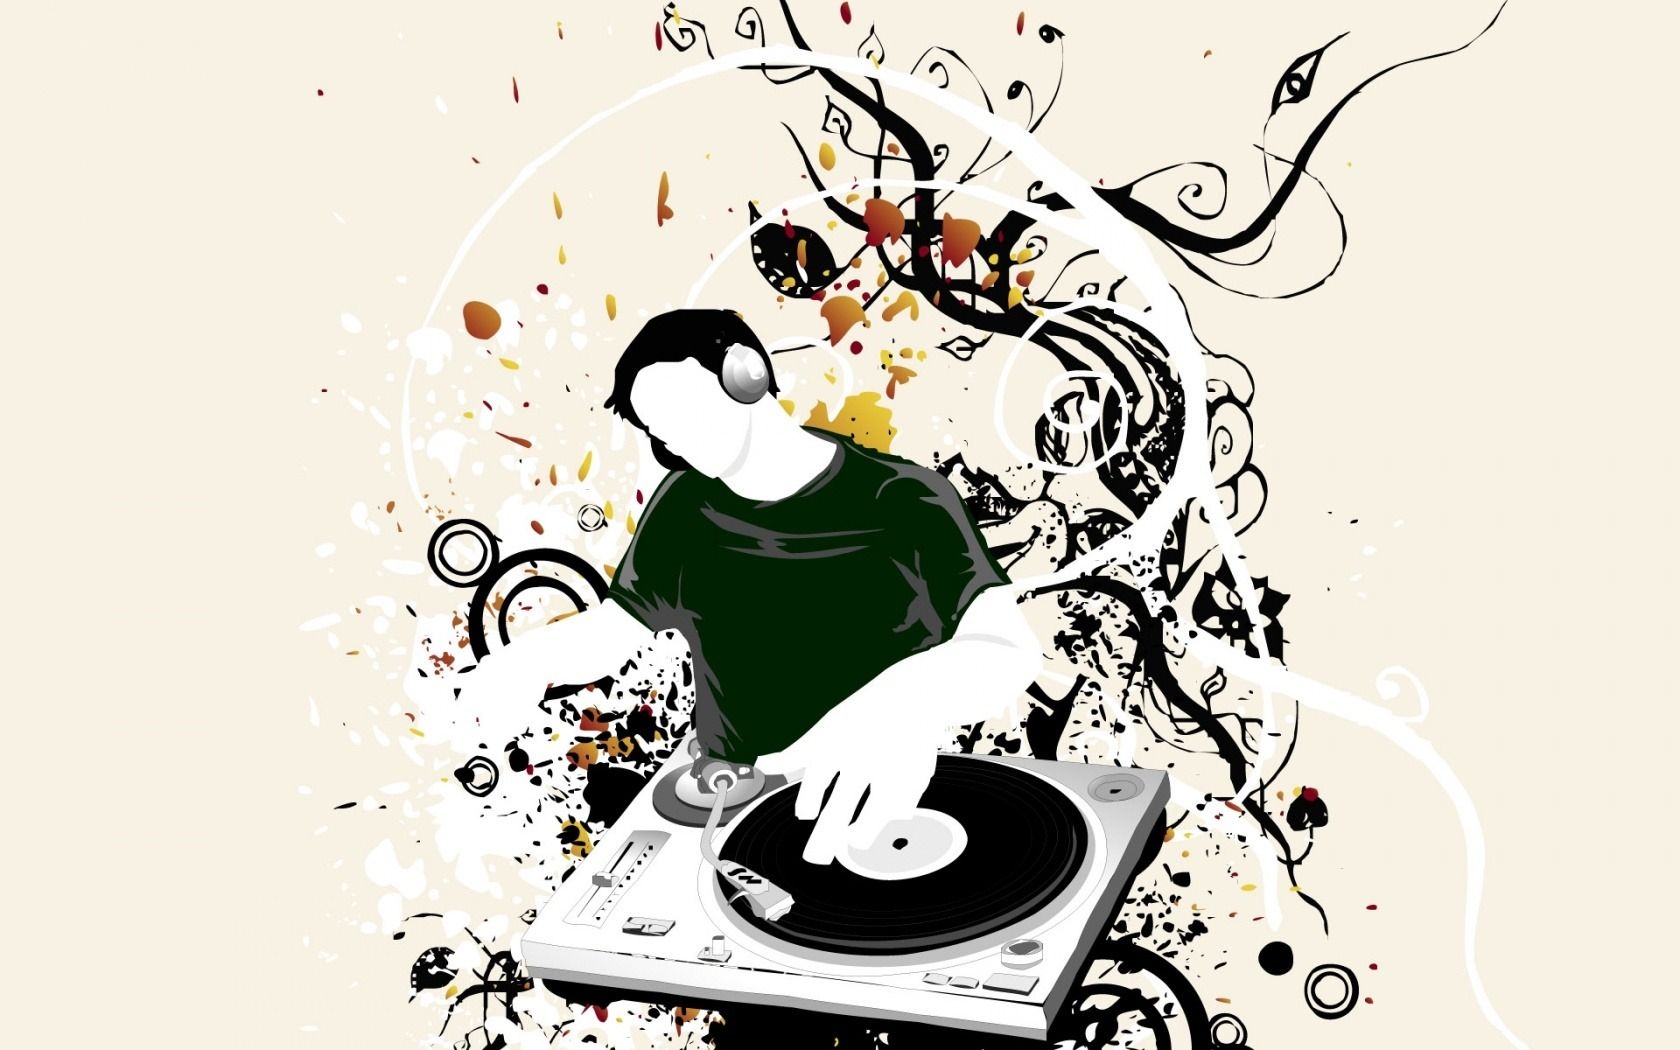 DJ矢量 插画设计桌面壁纸图片